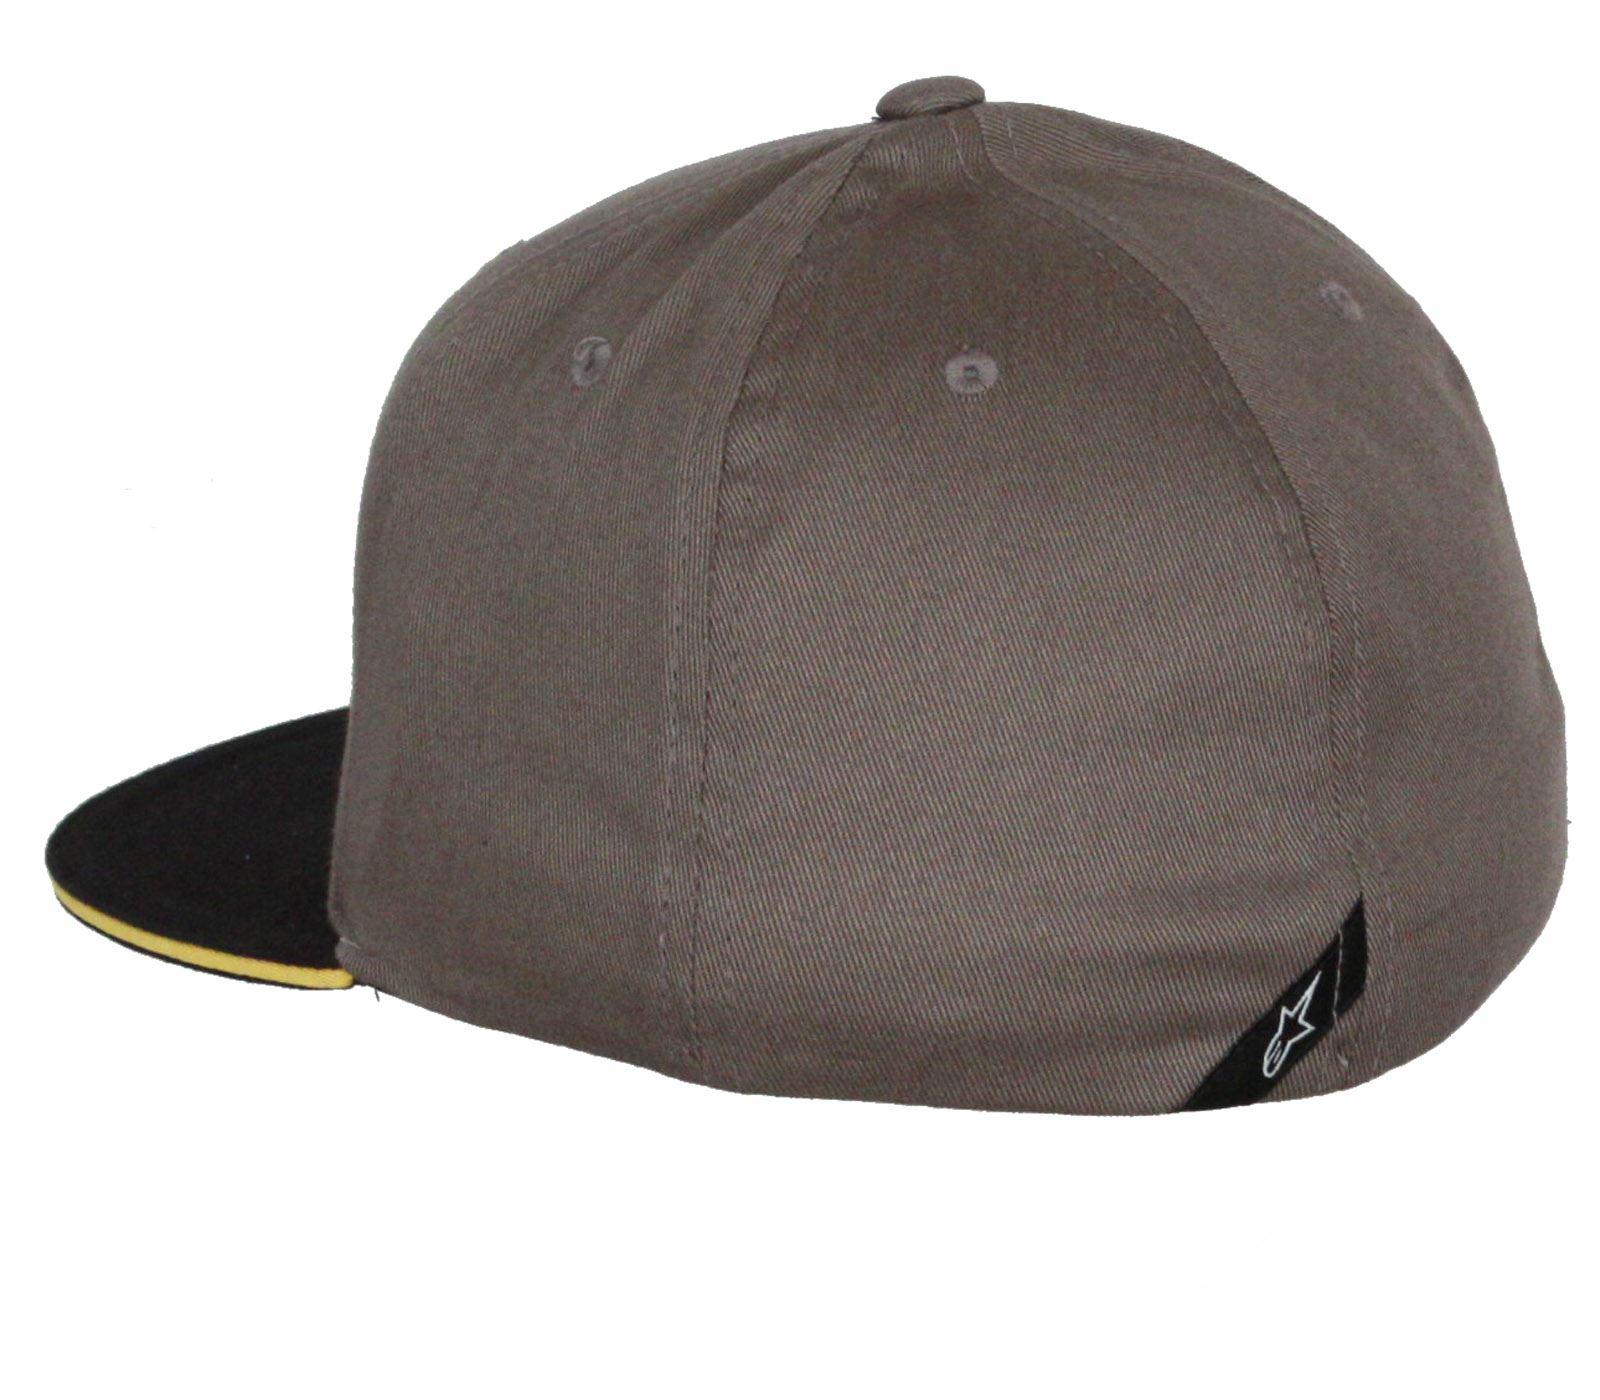 b96ca3a24896a Alpinestars-Flexfit-Flatbill-Cap-Ageless-charcoal thumbnail 6